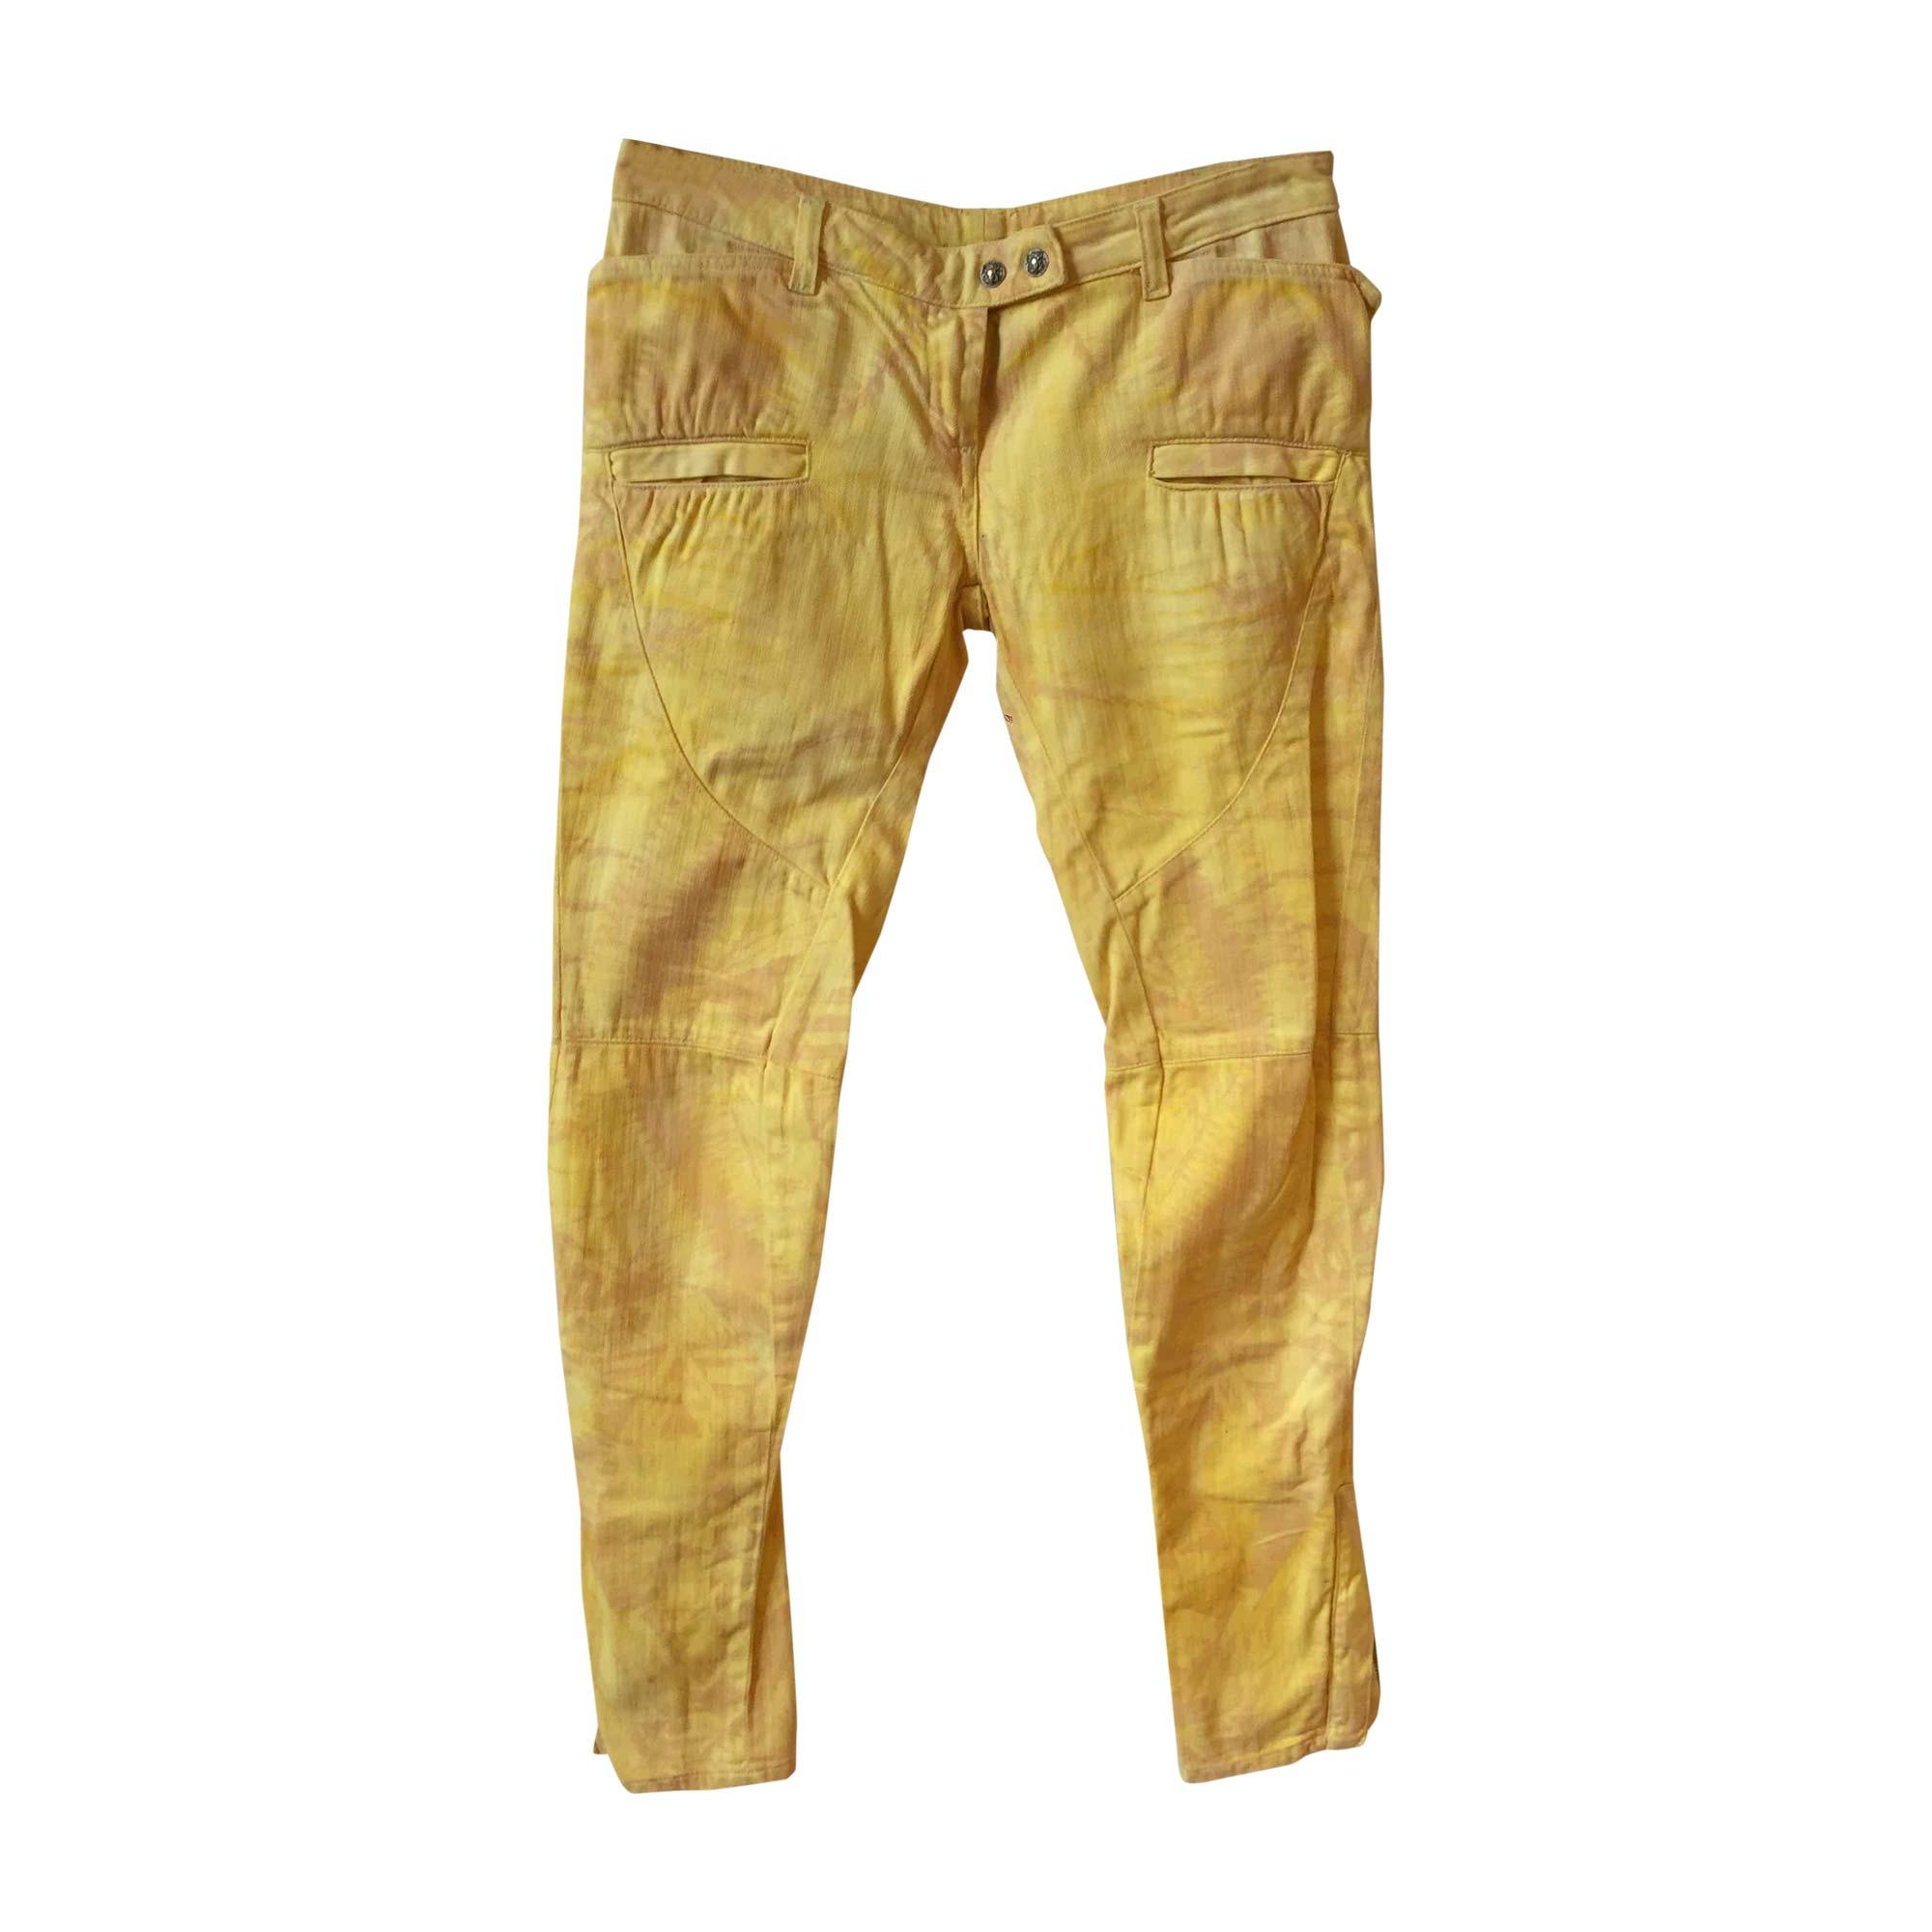 14131bcc Skinny Jeans BALMAIN W28 (T 38) yellow - 7593857